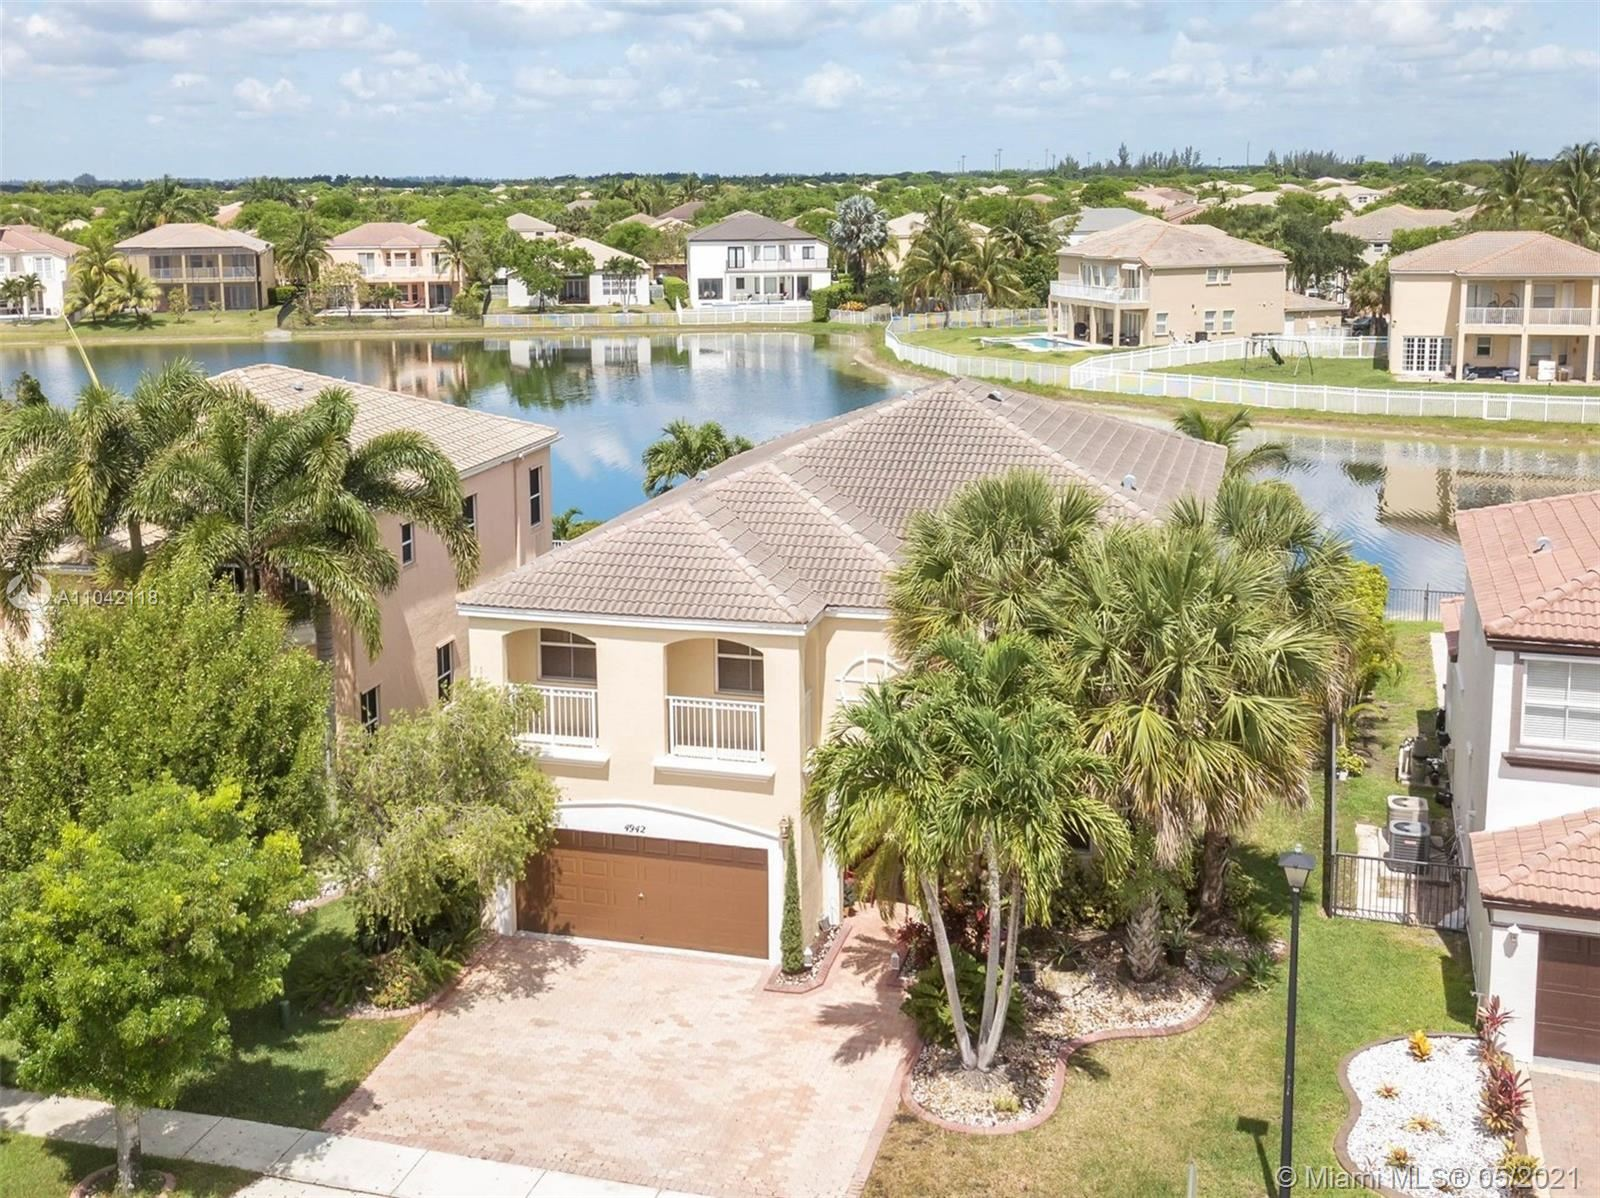 Photo of 4942 SW 159th Ave, Miramar, FL 33027 (MLS # A11042118)